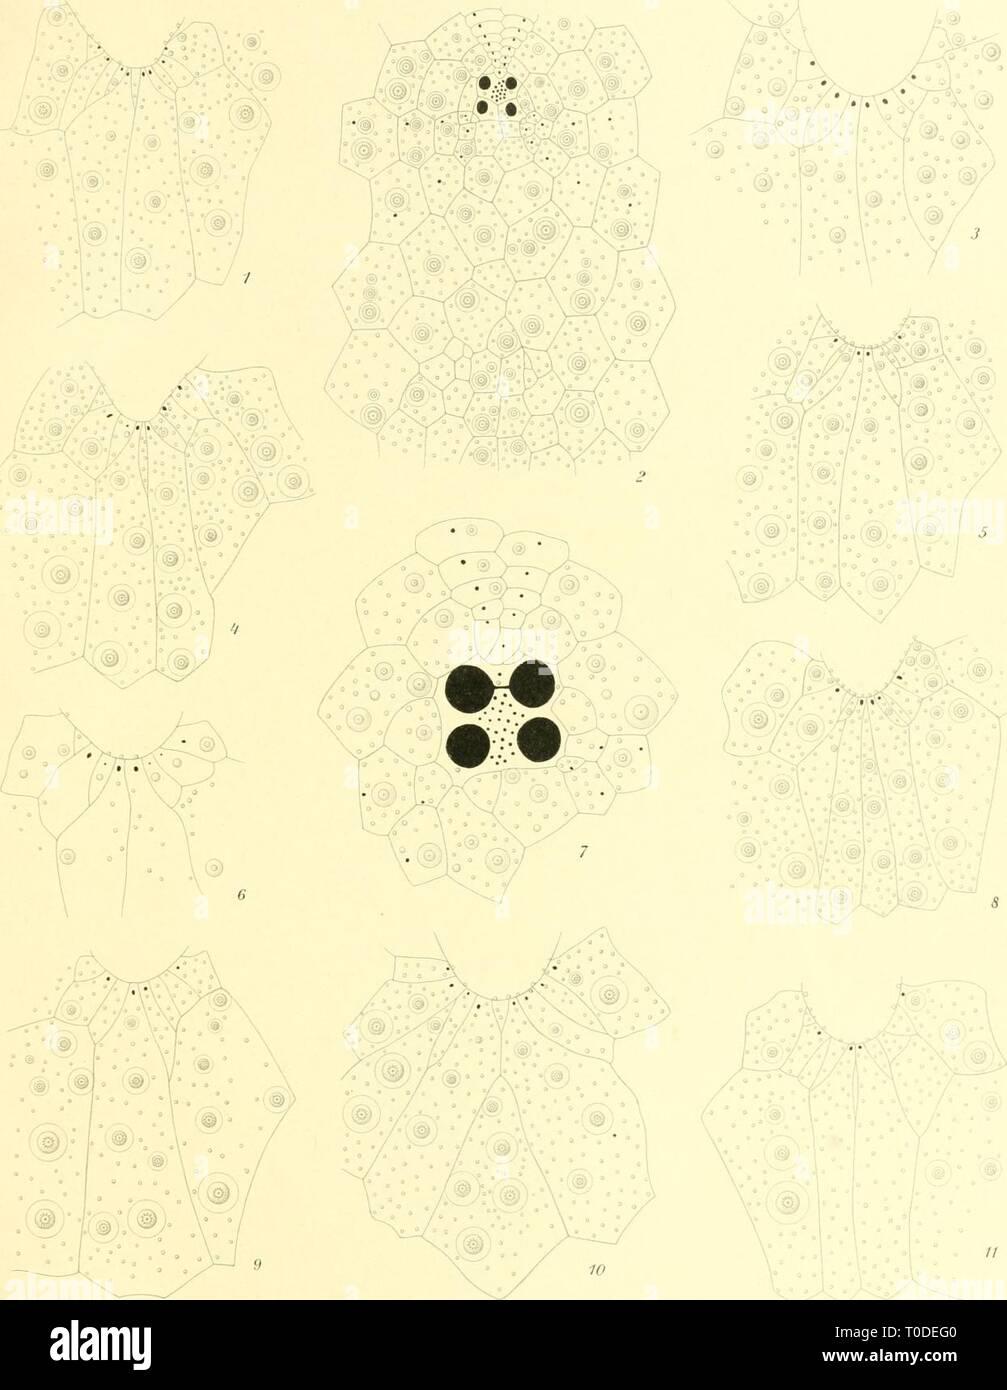 "Echinoidea (1903) Echinoidea echinoidea00mort Anno: 1903 fil fjolf I'.'xpt'ilitioitcit II"", Til.Mortensen, Echuioidea 11. Scheda. )""/// TTUkfoT-teKstn del. 13. 7. ronr-liilc^ia M'/ini/di Mrlsii., ""l (!. è 11. Poni-la Ic.-iid .leffrt i'/.""ii U'.J'/i. Foto Stock"